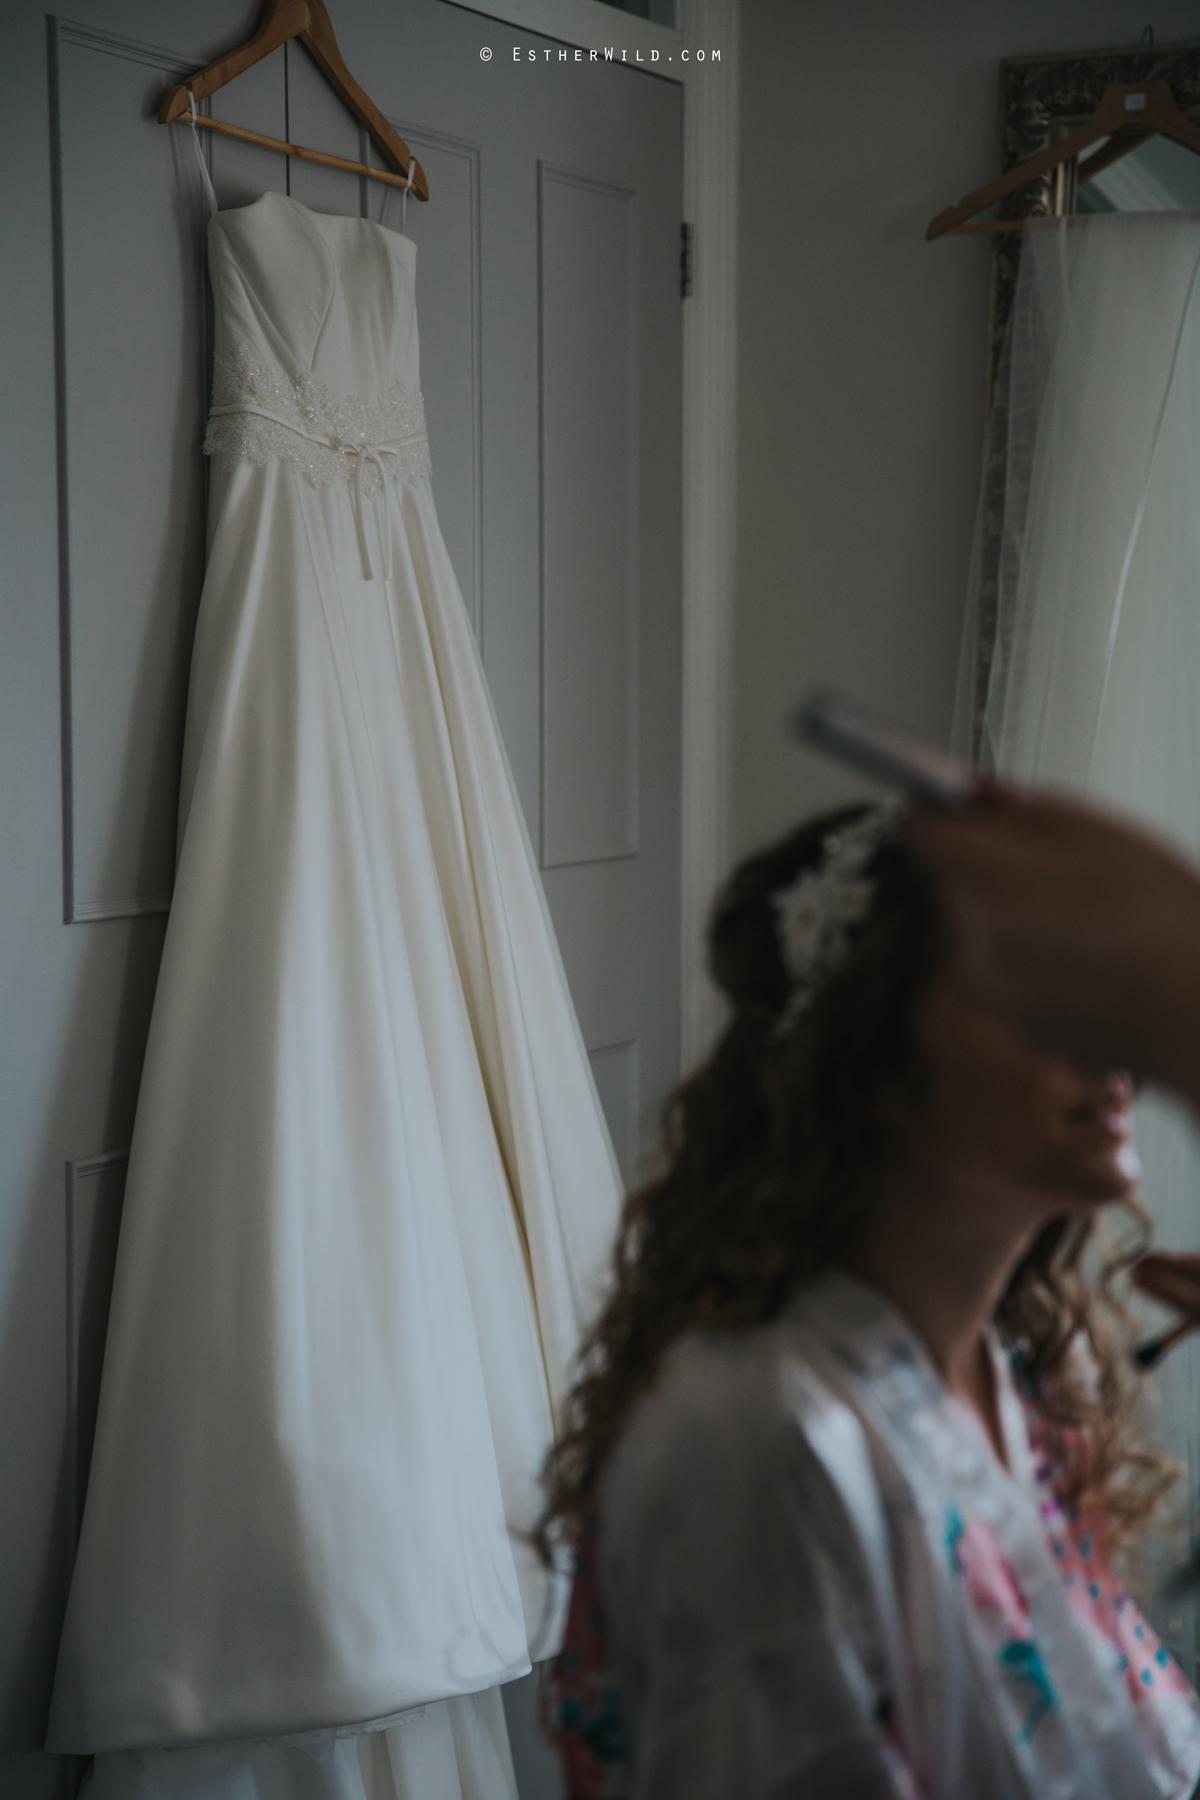 The_BoatHouse_Wedding_Venue_Ormesby_Norfolk_Broads_Boat_Wedding_Photography_Esther_Wild_Photographer_IMG_0305.jpg